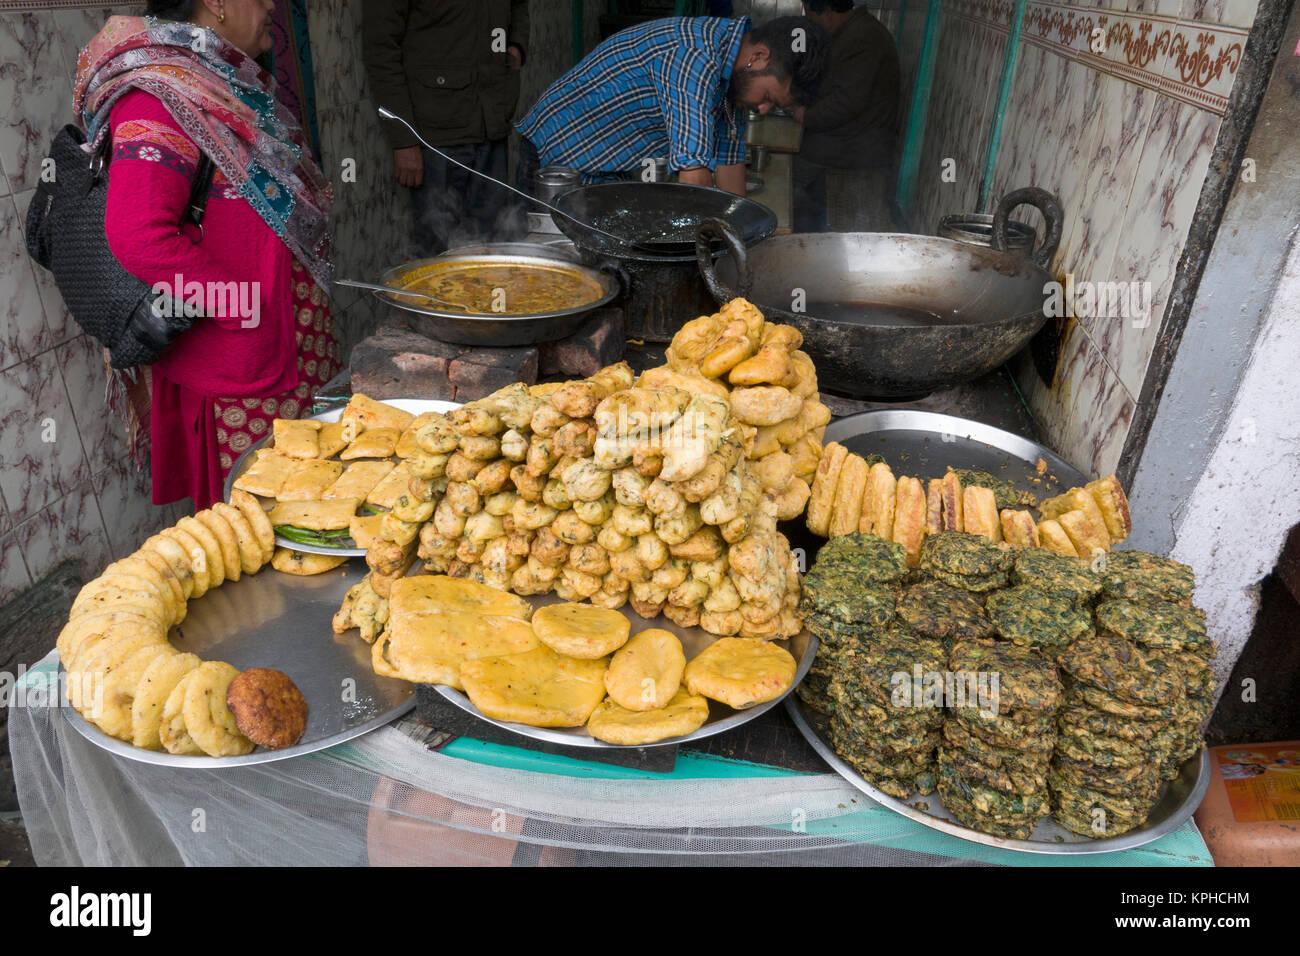 Fried Indian street food on lower Bazaar market in Shimla, India - Stock Image